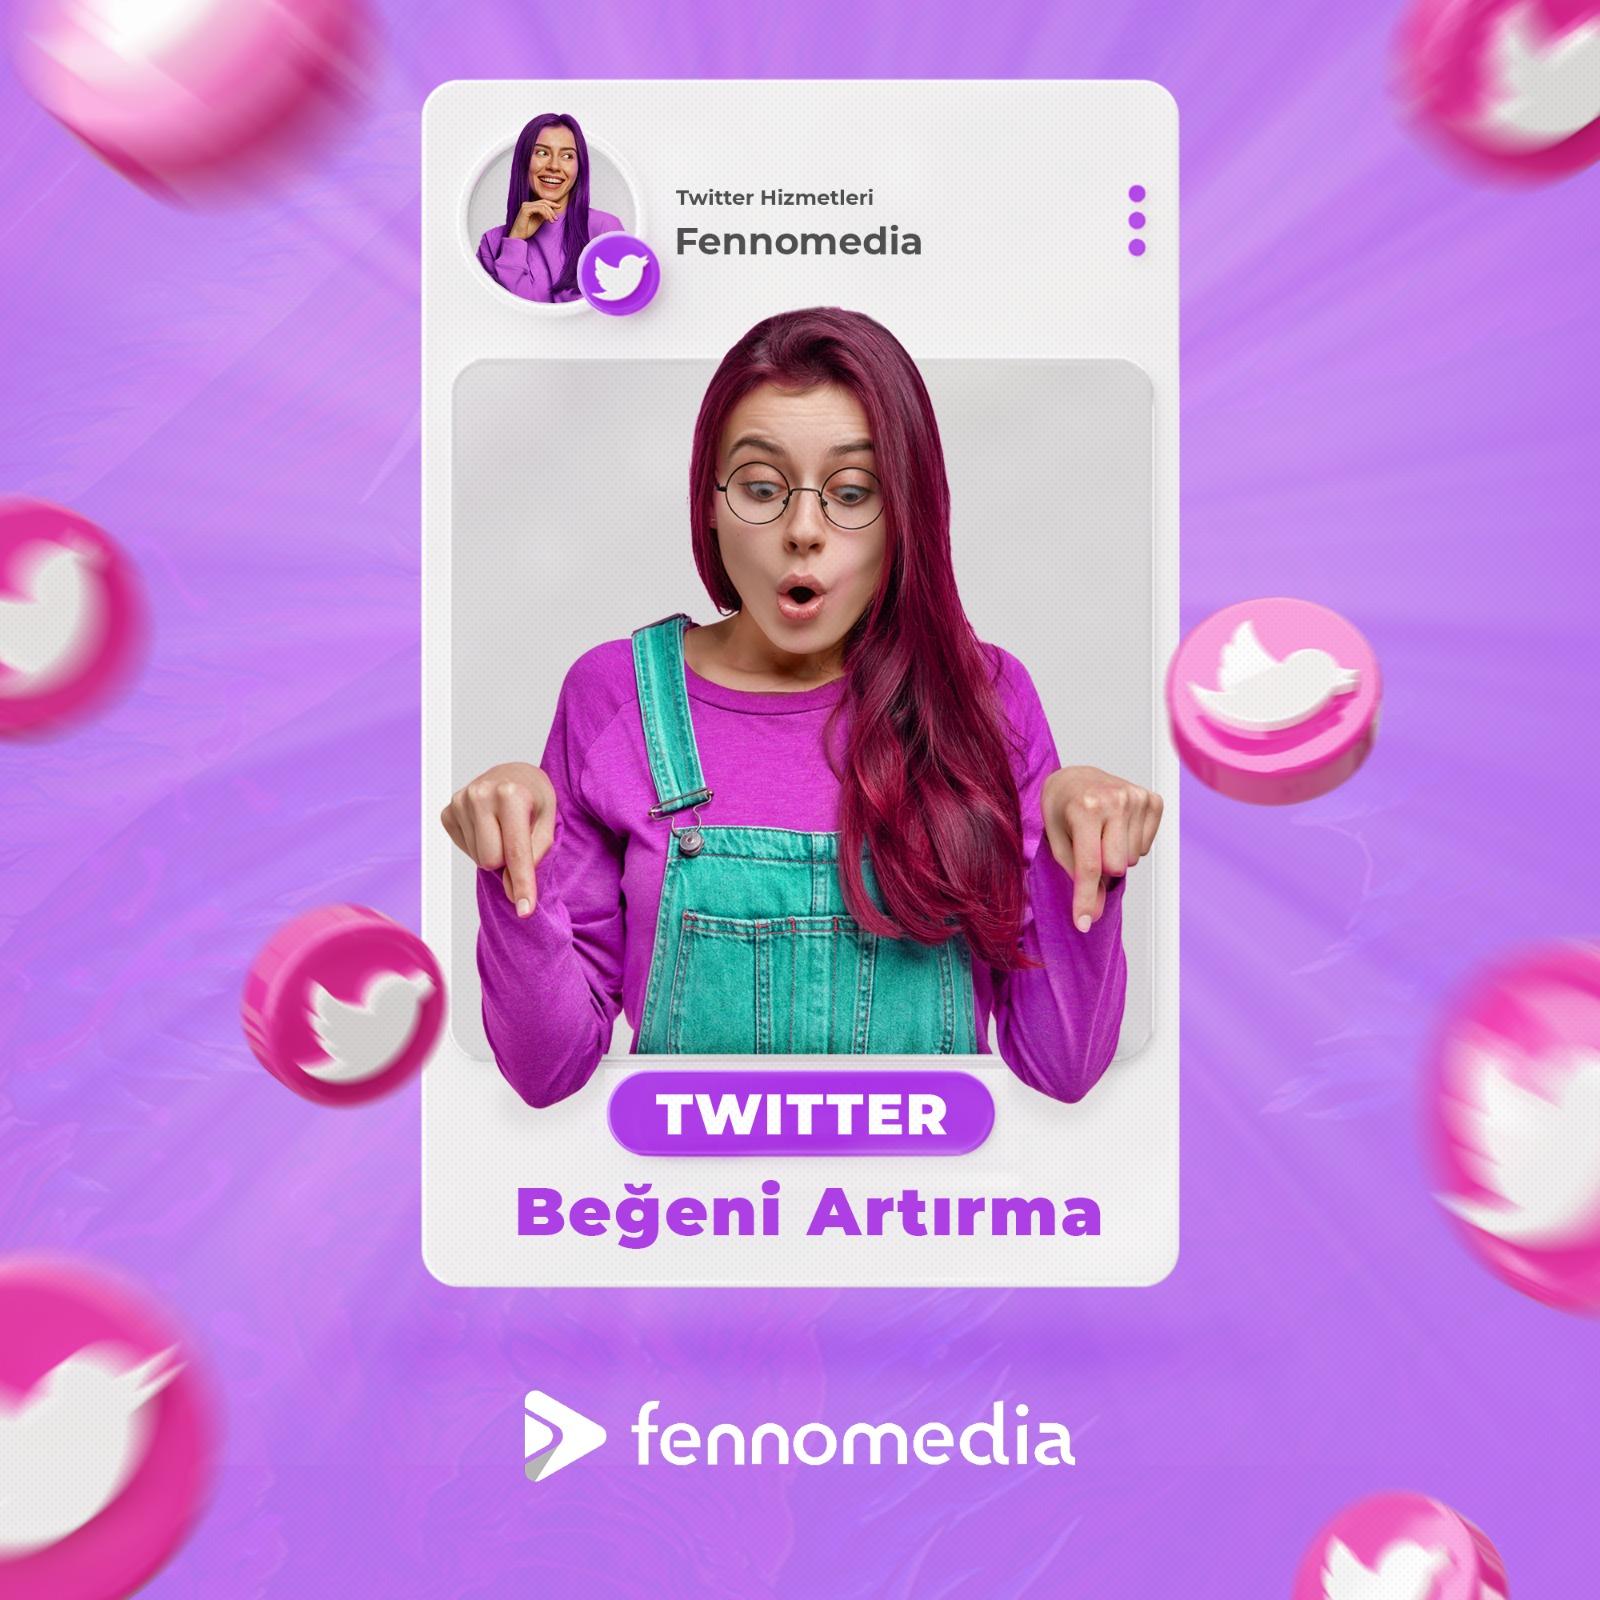 Twitter beğeni artırma